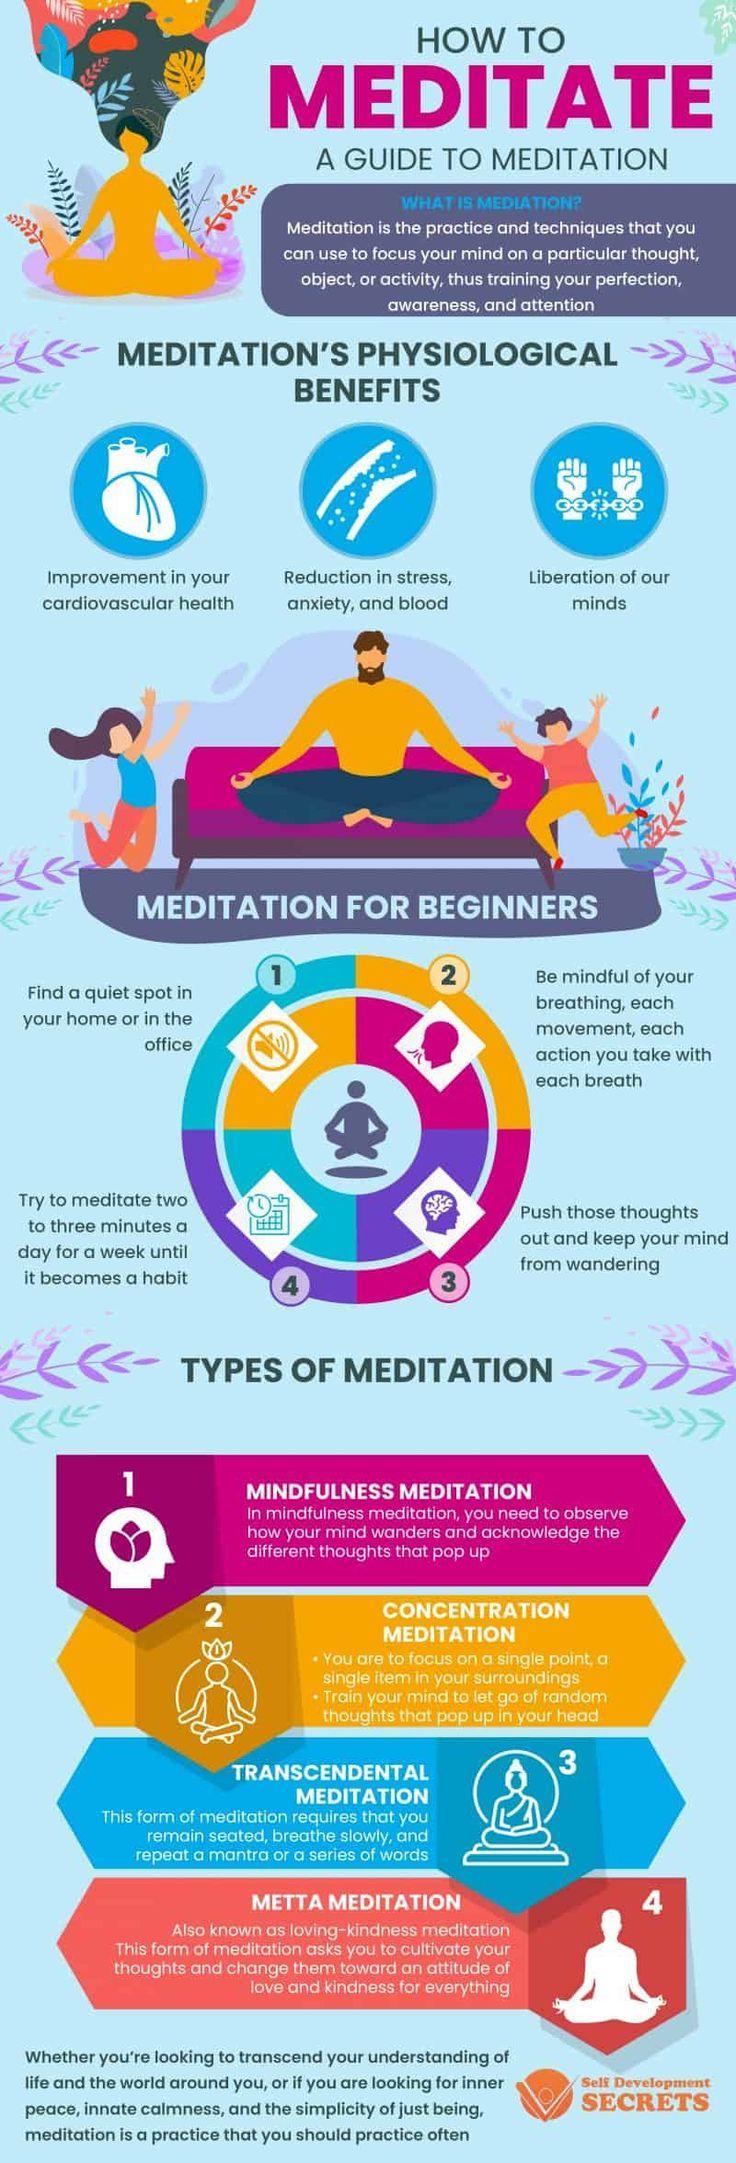 17+ Advanced buddhist meditation techniques ideas